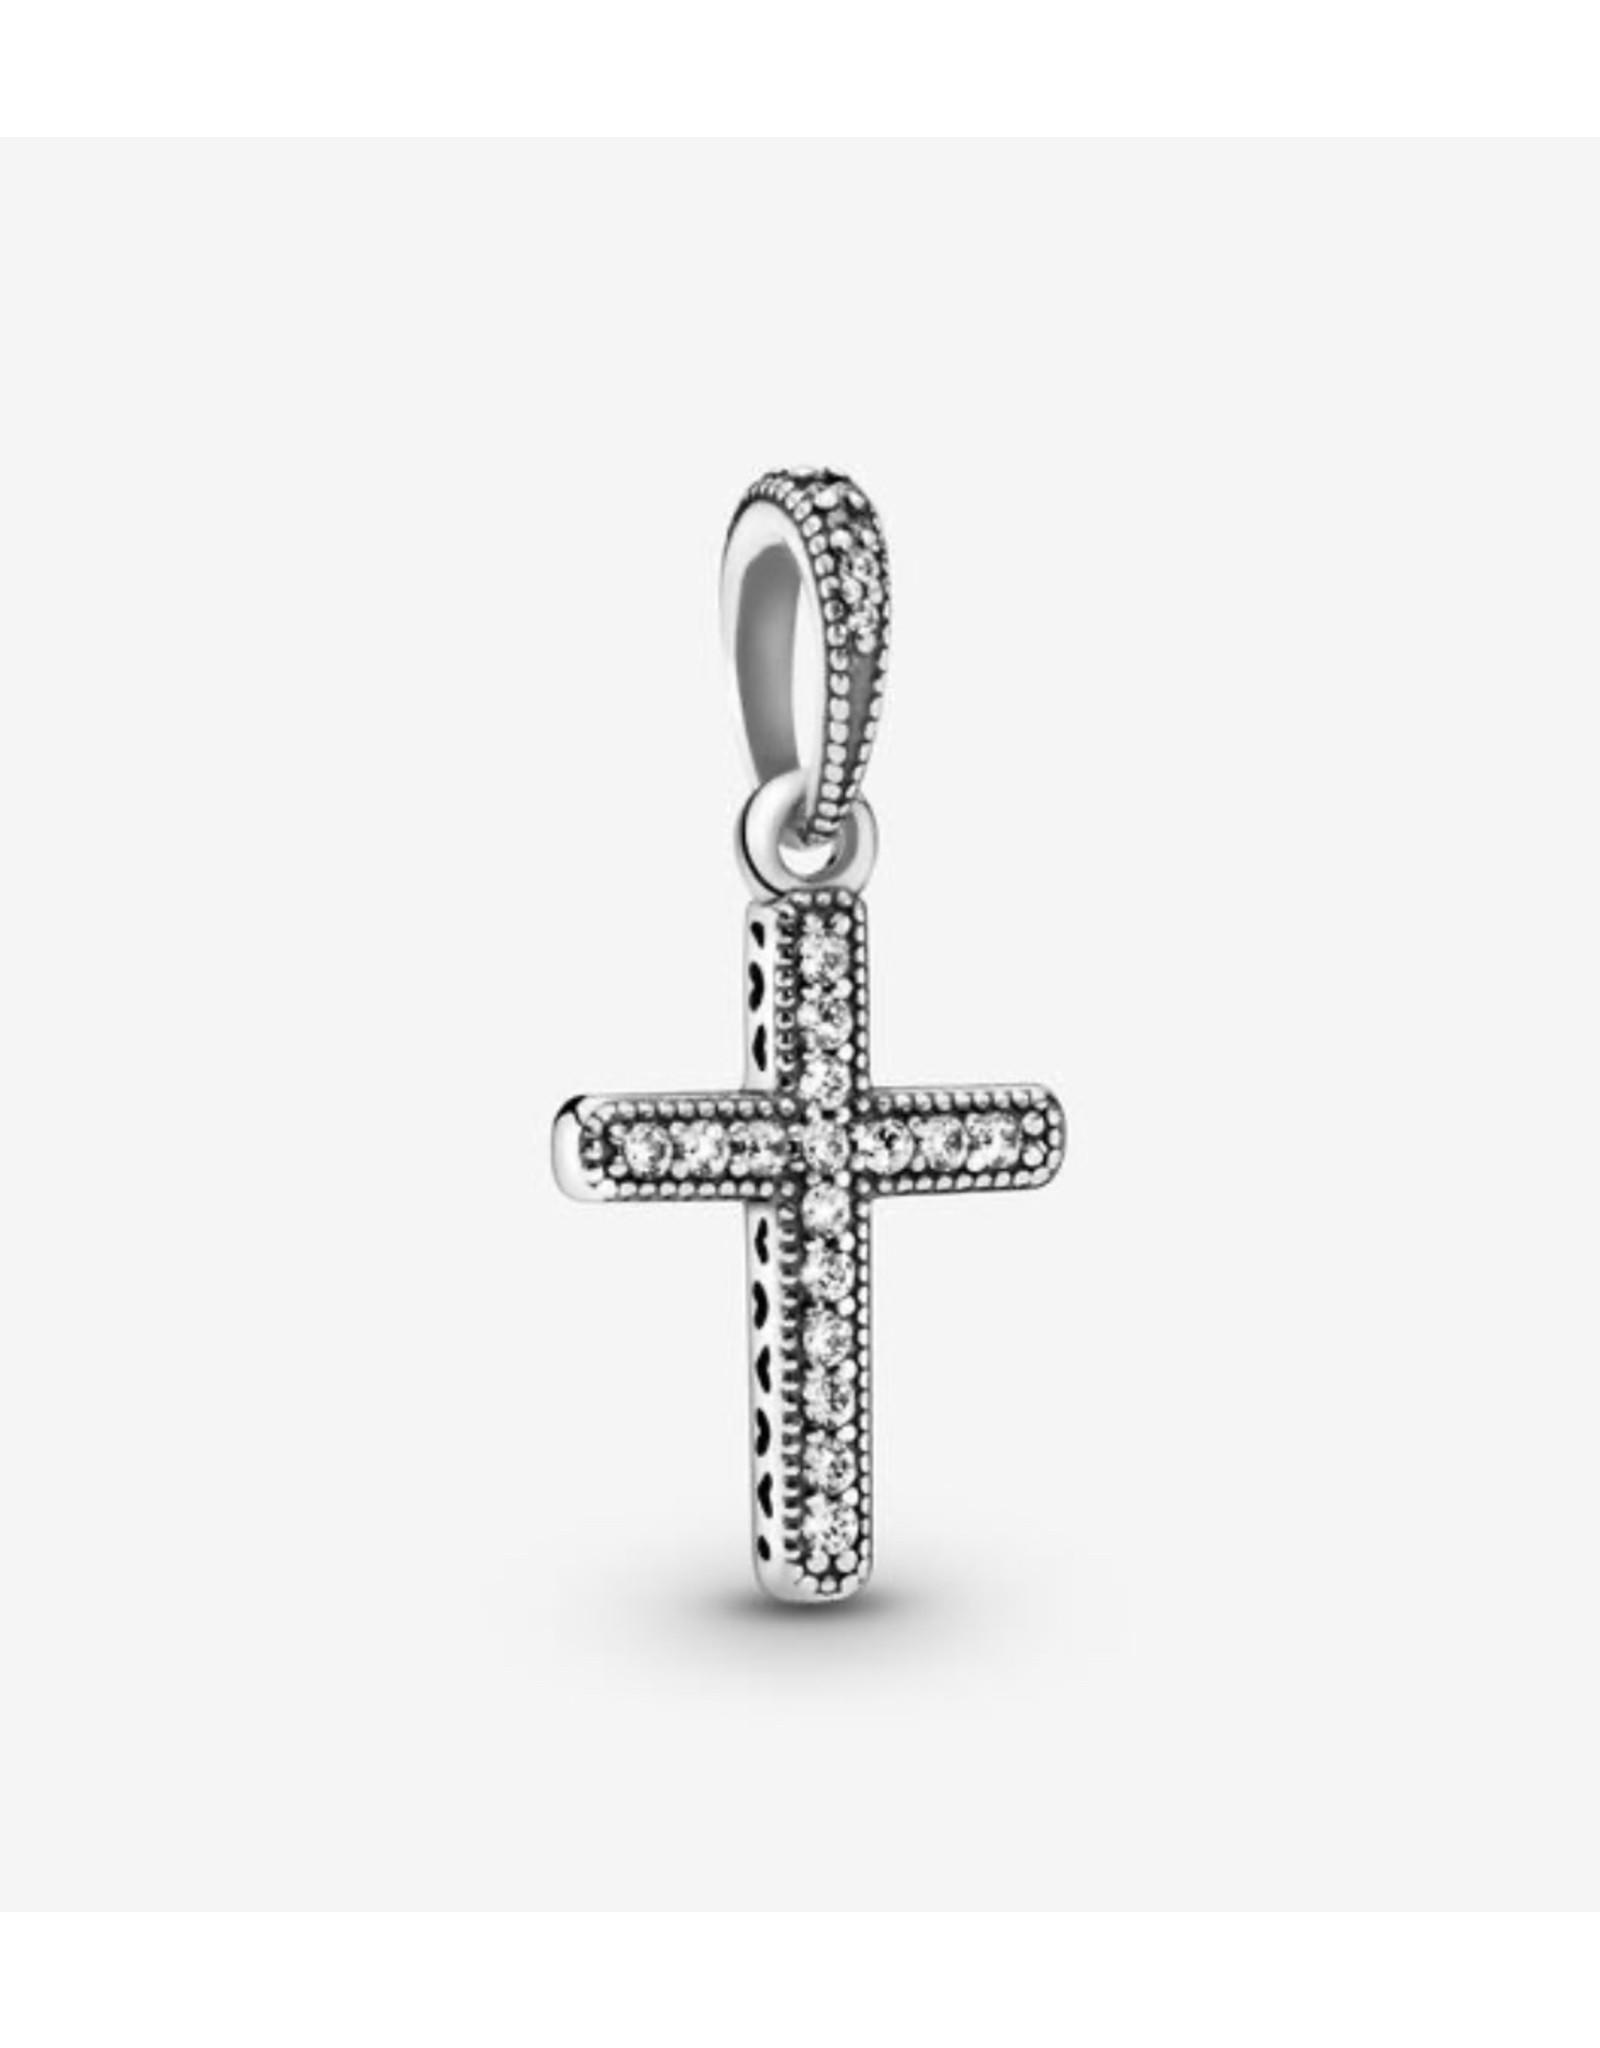 Pandora Pandora Pendant,397571CZ, Sparkling Cross, Sterling Silver Clear CZ